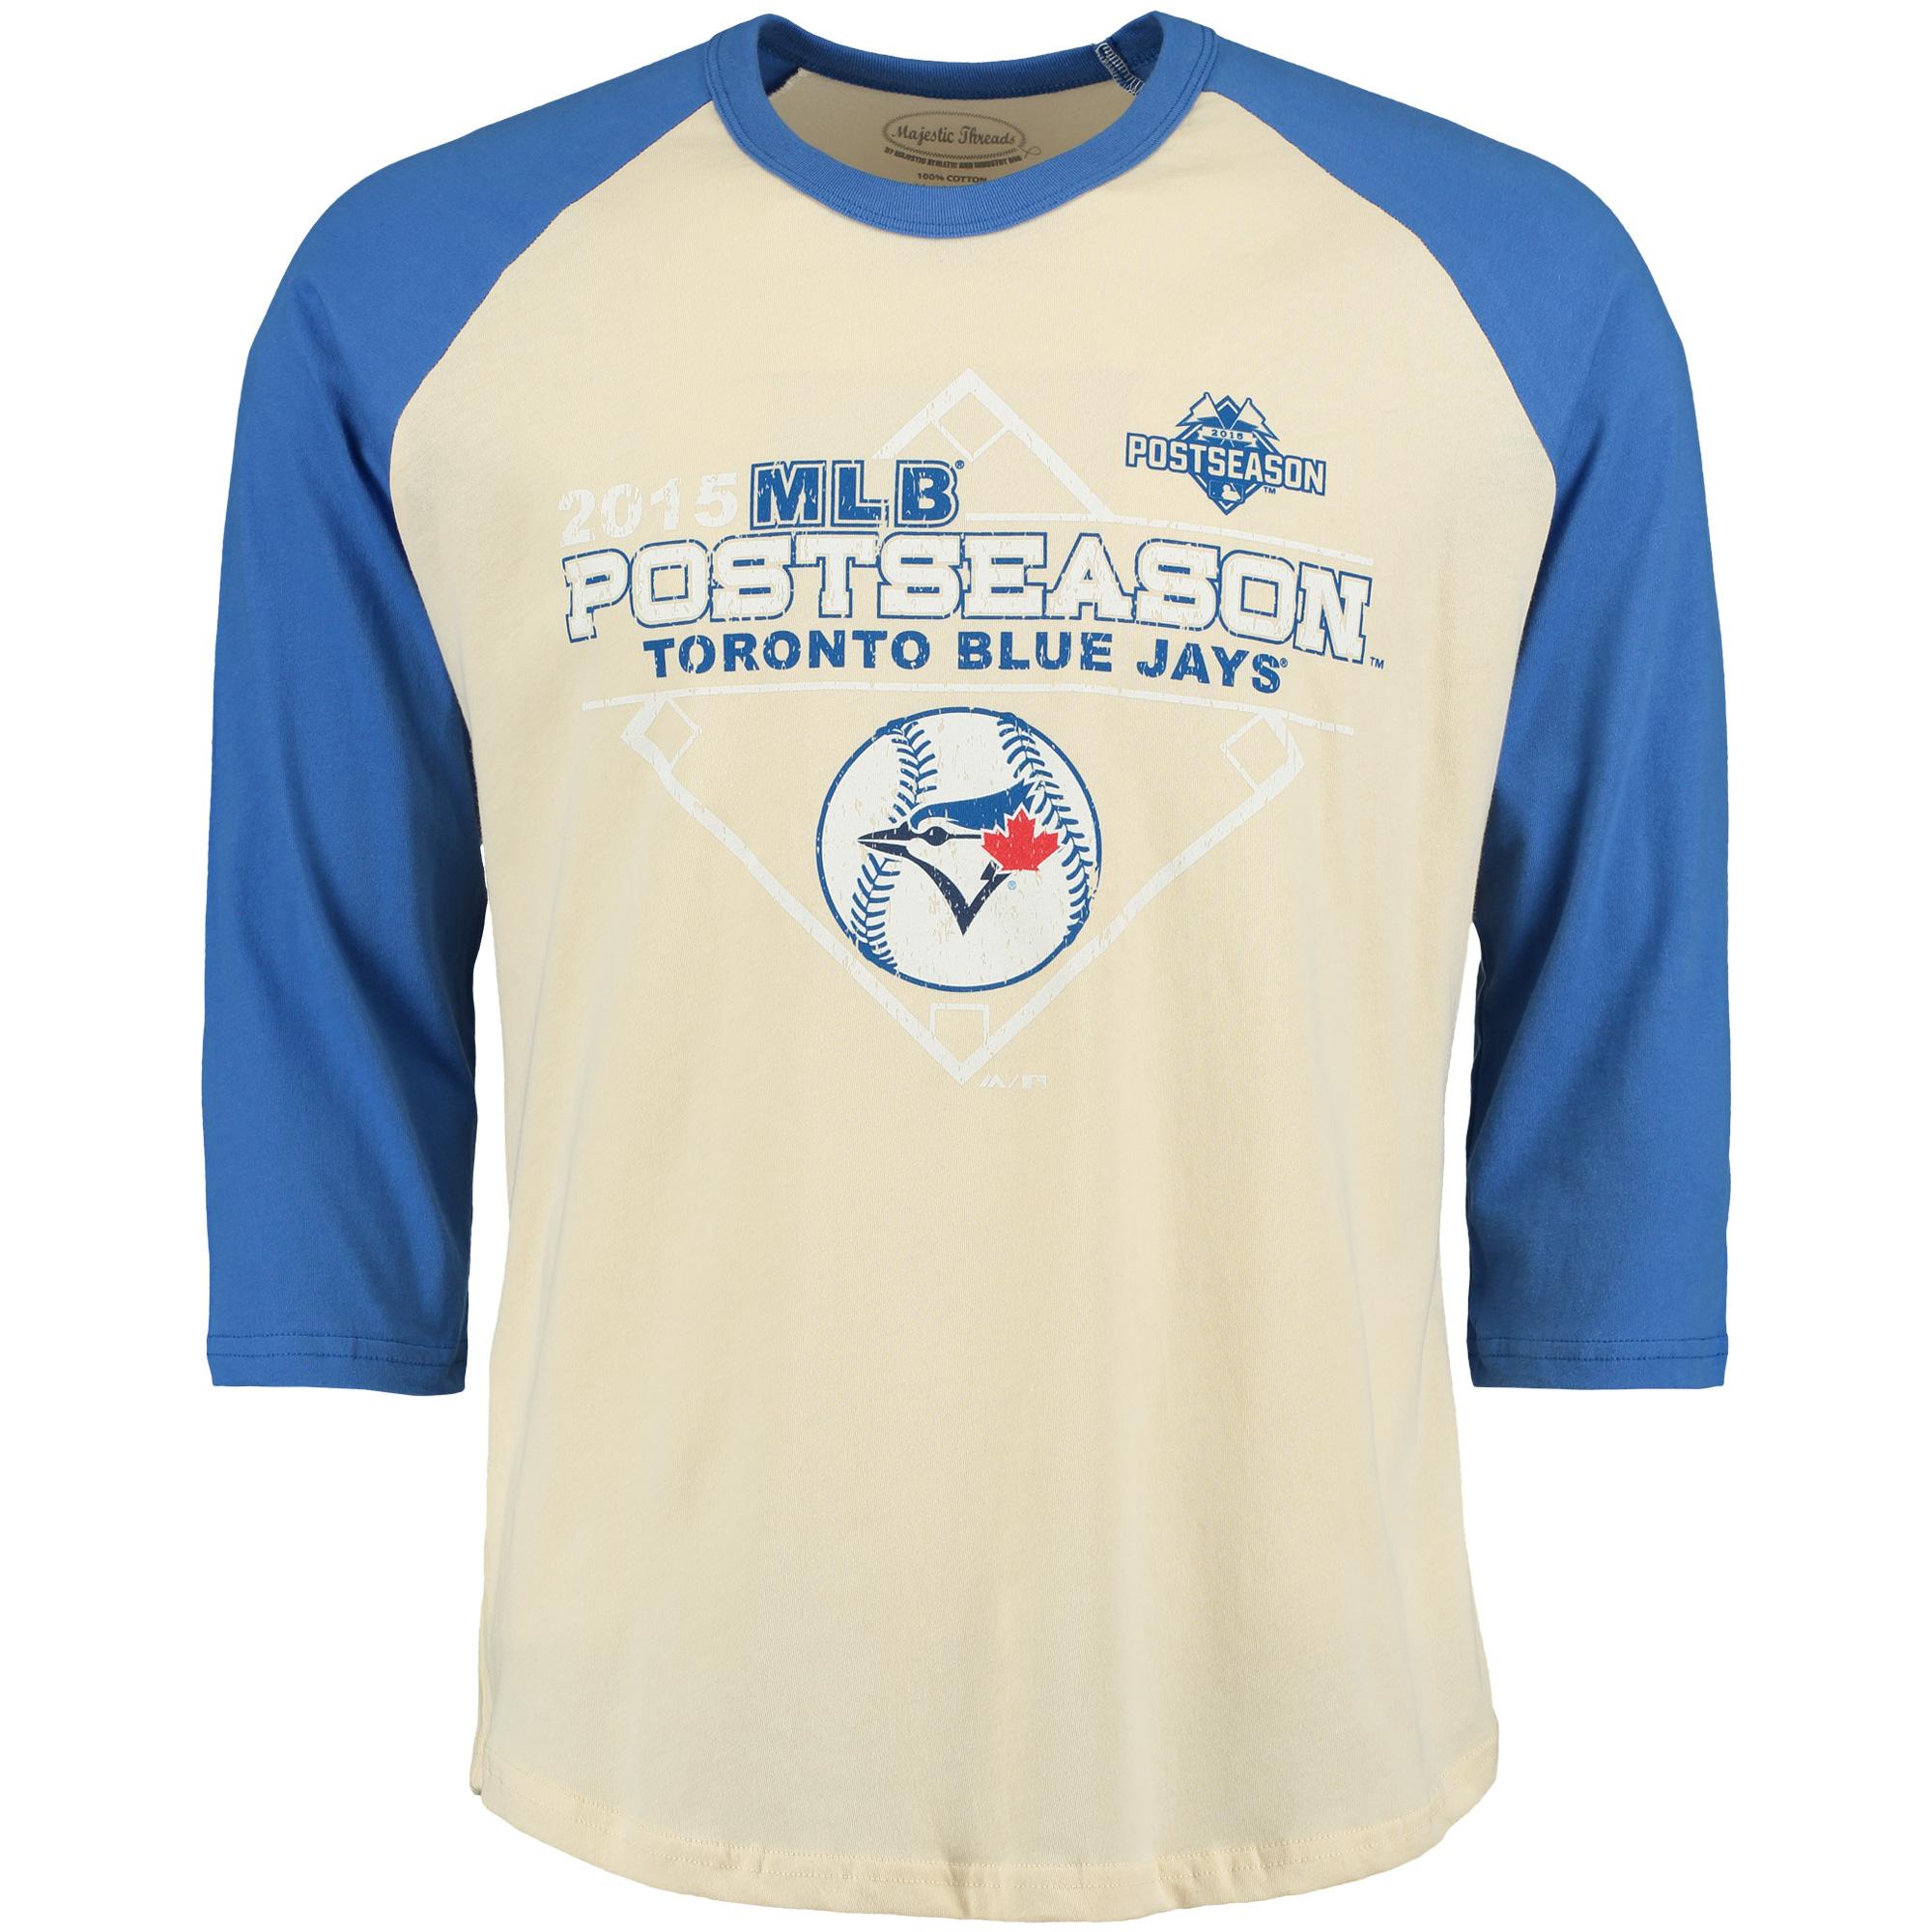 Toronto Blue Jays Majestic Threads 2015 Postseason Premium Raglan T-Shirt